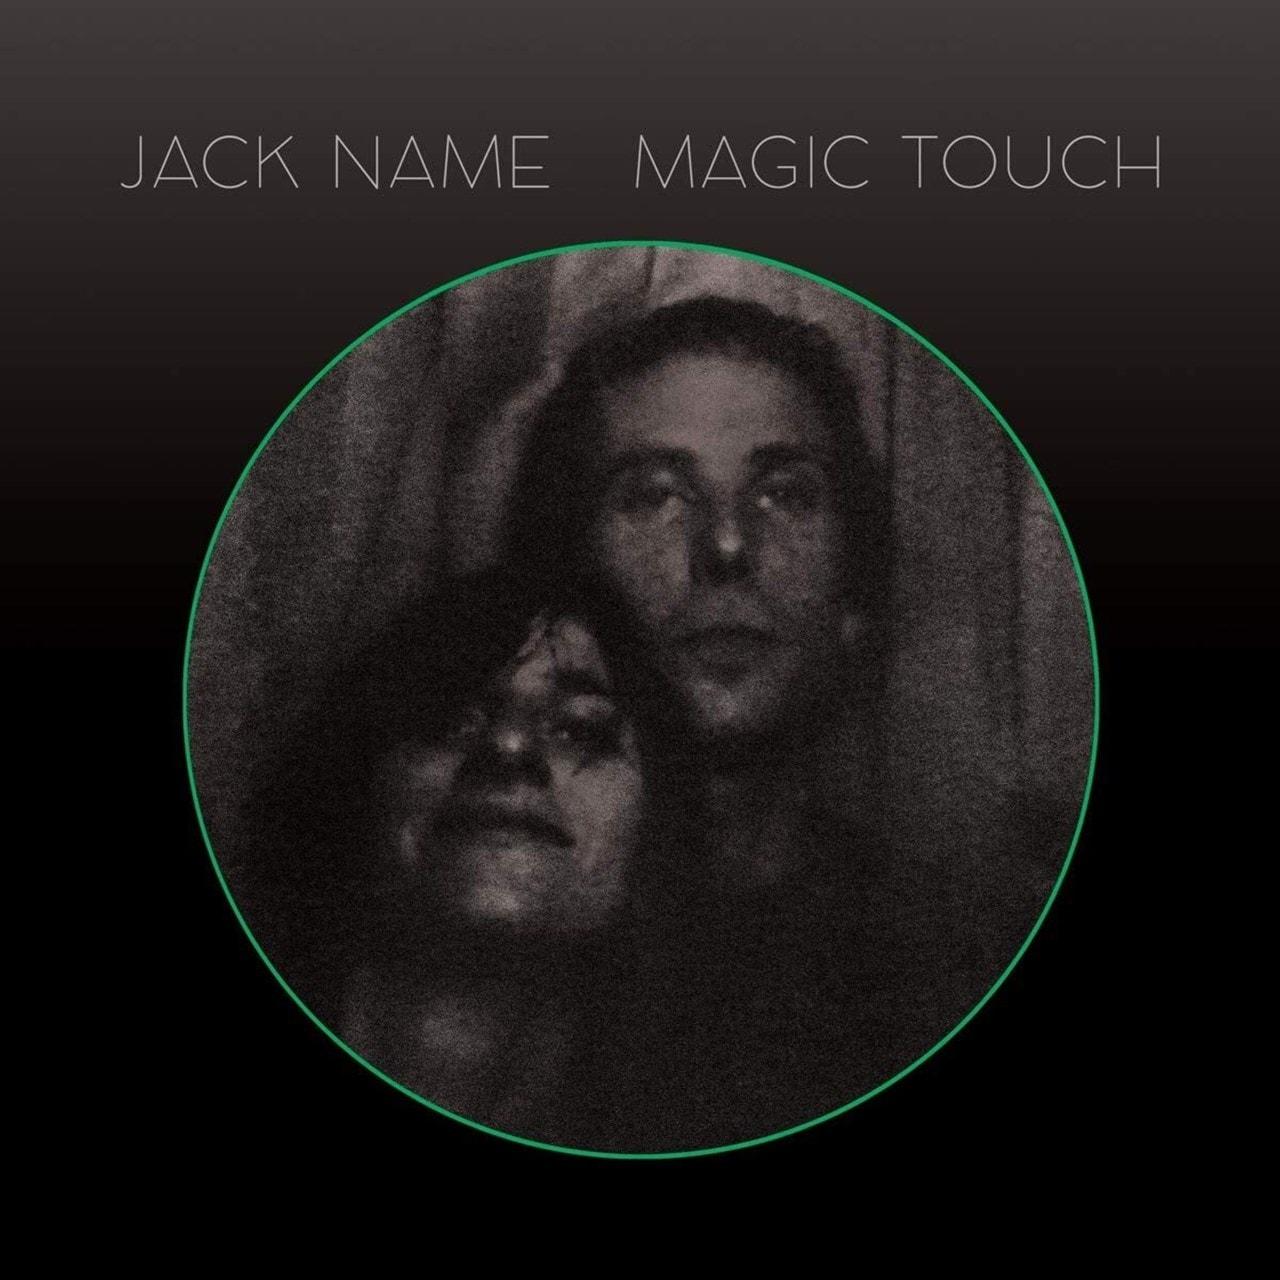 Magic Touch - 1